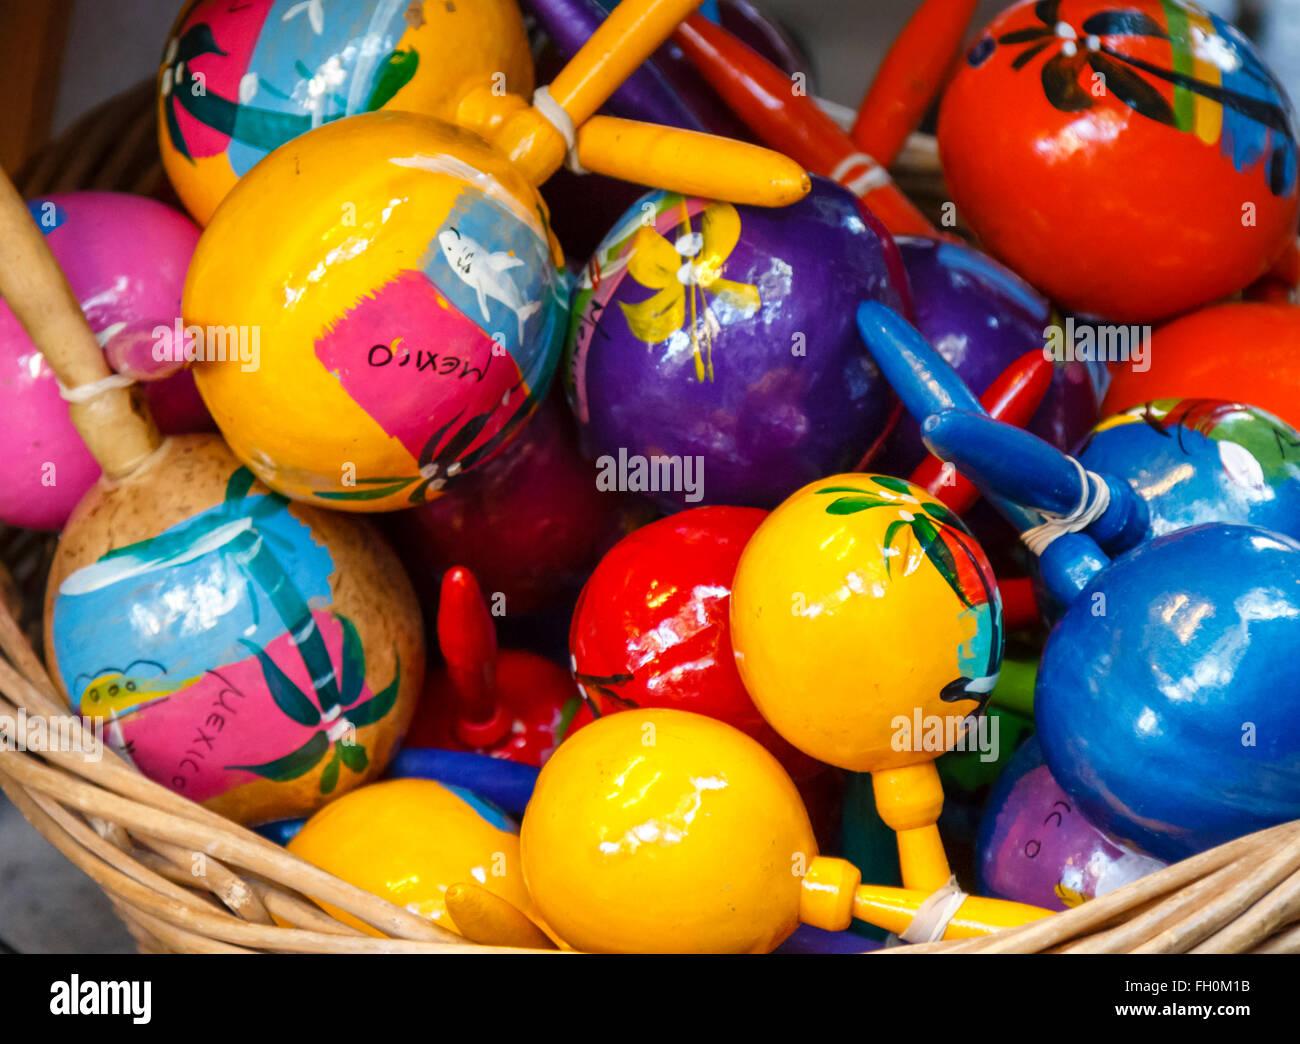 colorful maracas stock photos colorful maracas stock images alamy